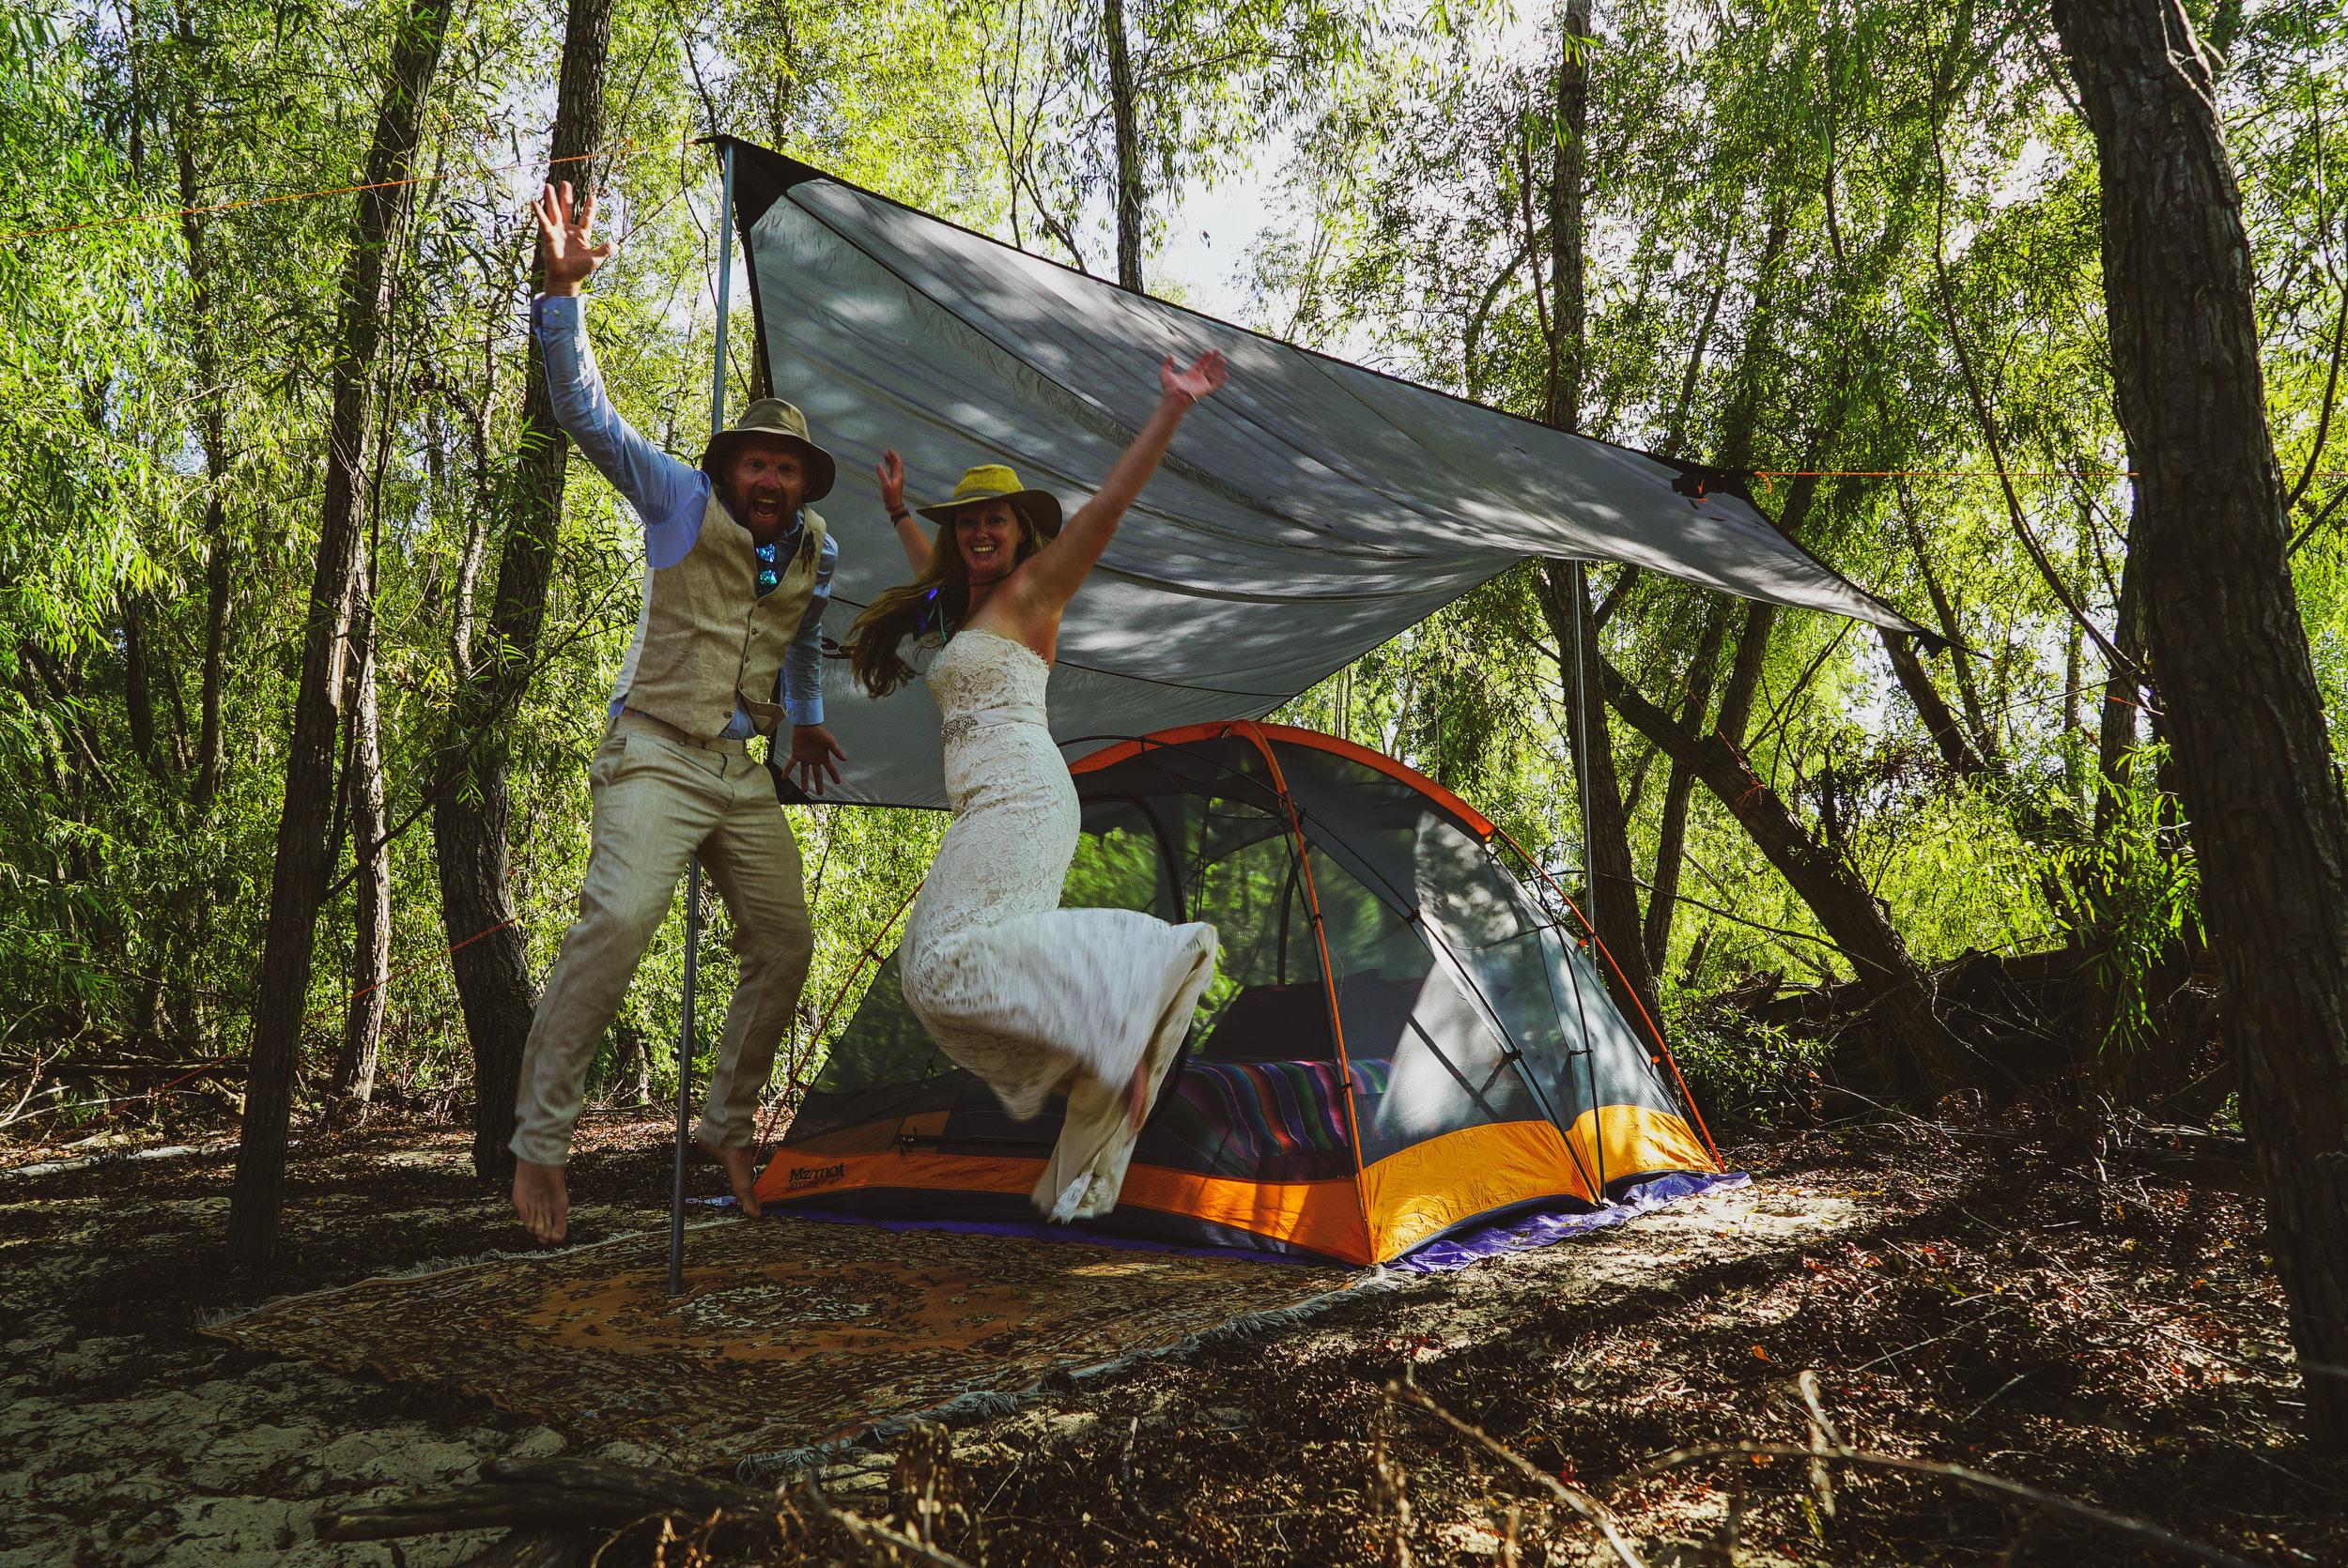 My latest photo story   Mississippi Honeymoon!    Featuring a desert island getaway